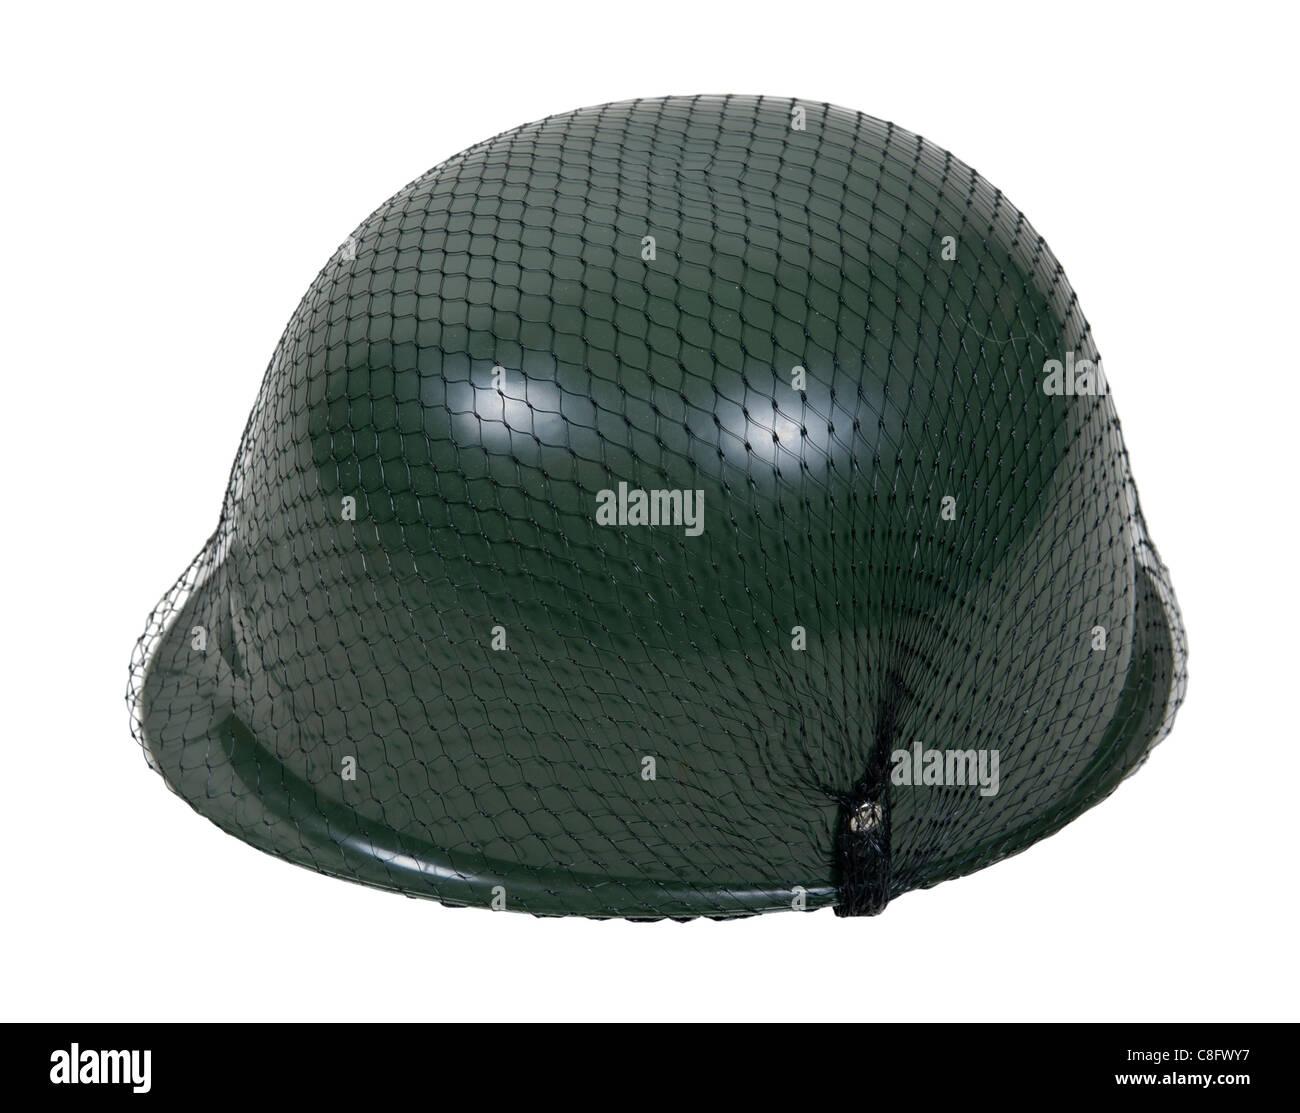 Grüne Militärhelm mit Netzgewebe drüber - Pfad enthalten Stockbild